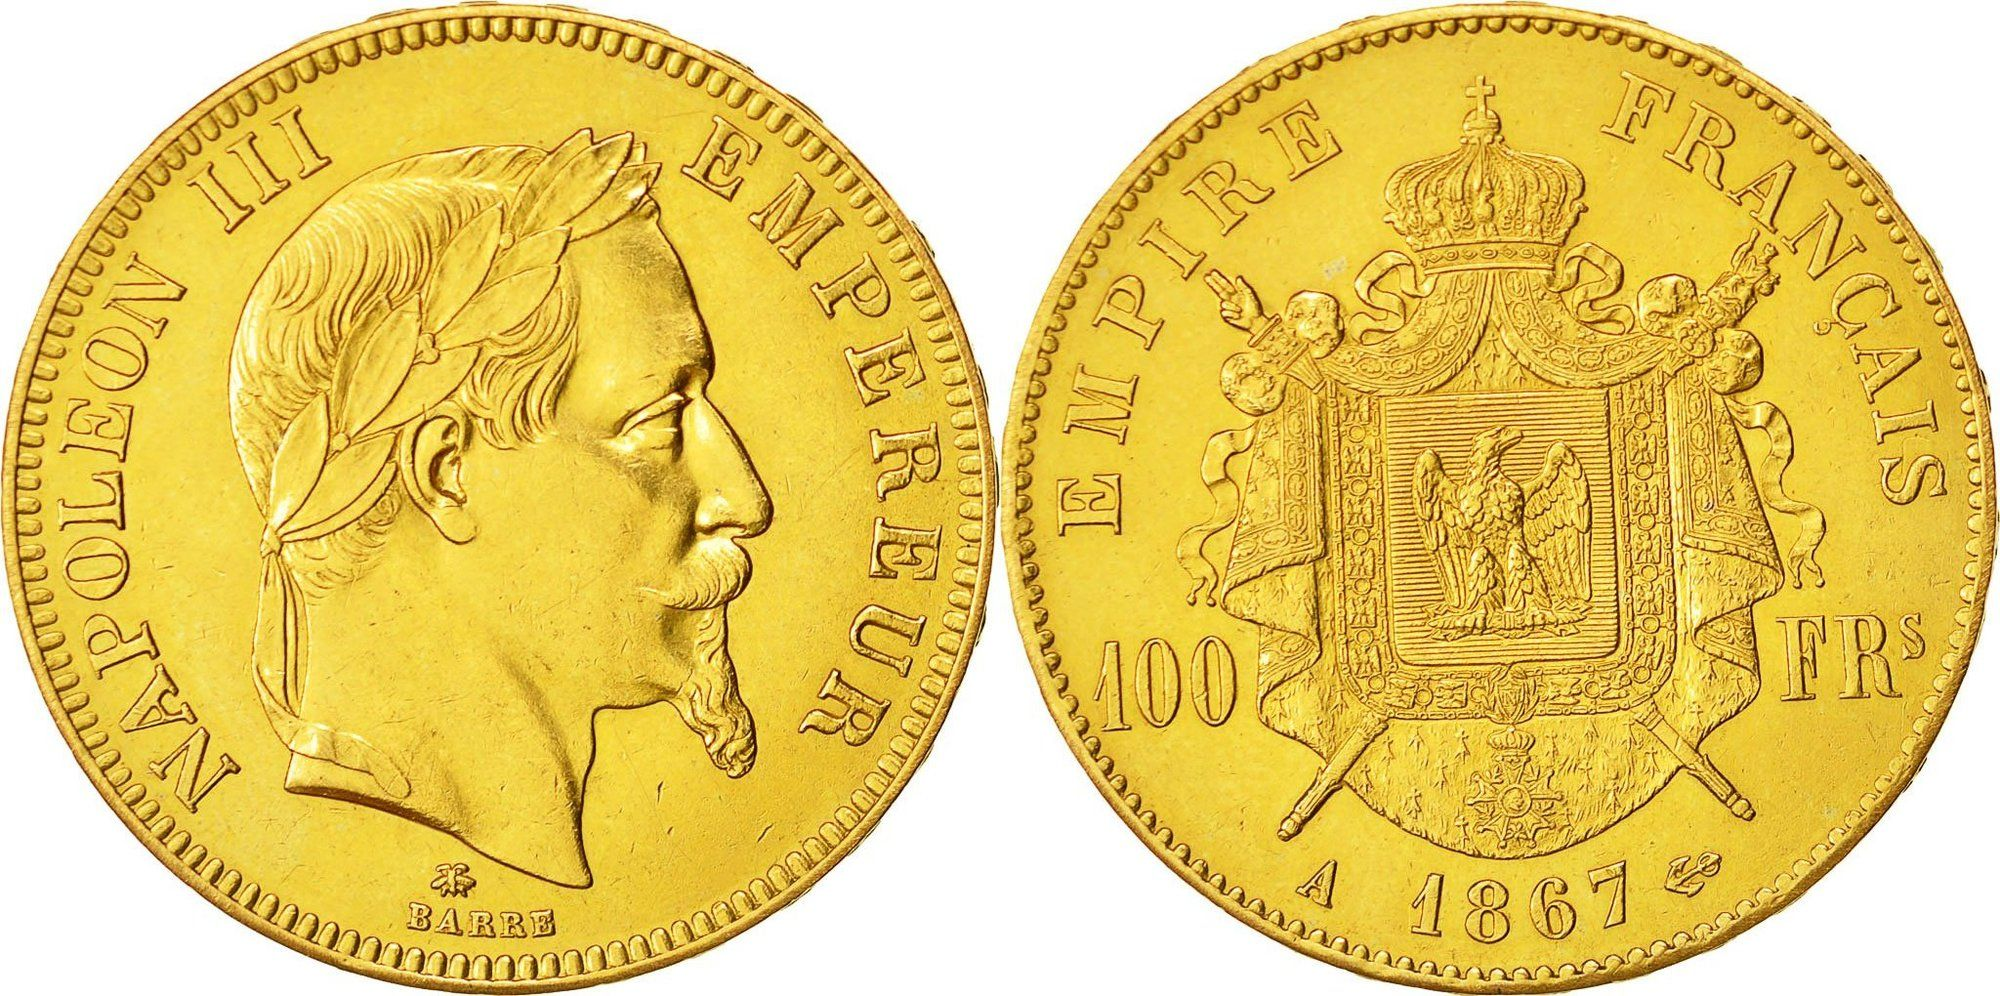 100 Francs 1867 A Frankreich Münze Napoleon Iii Paris Mashops